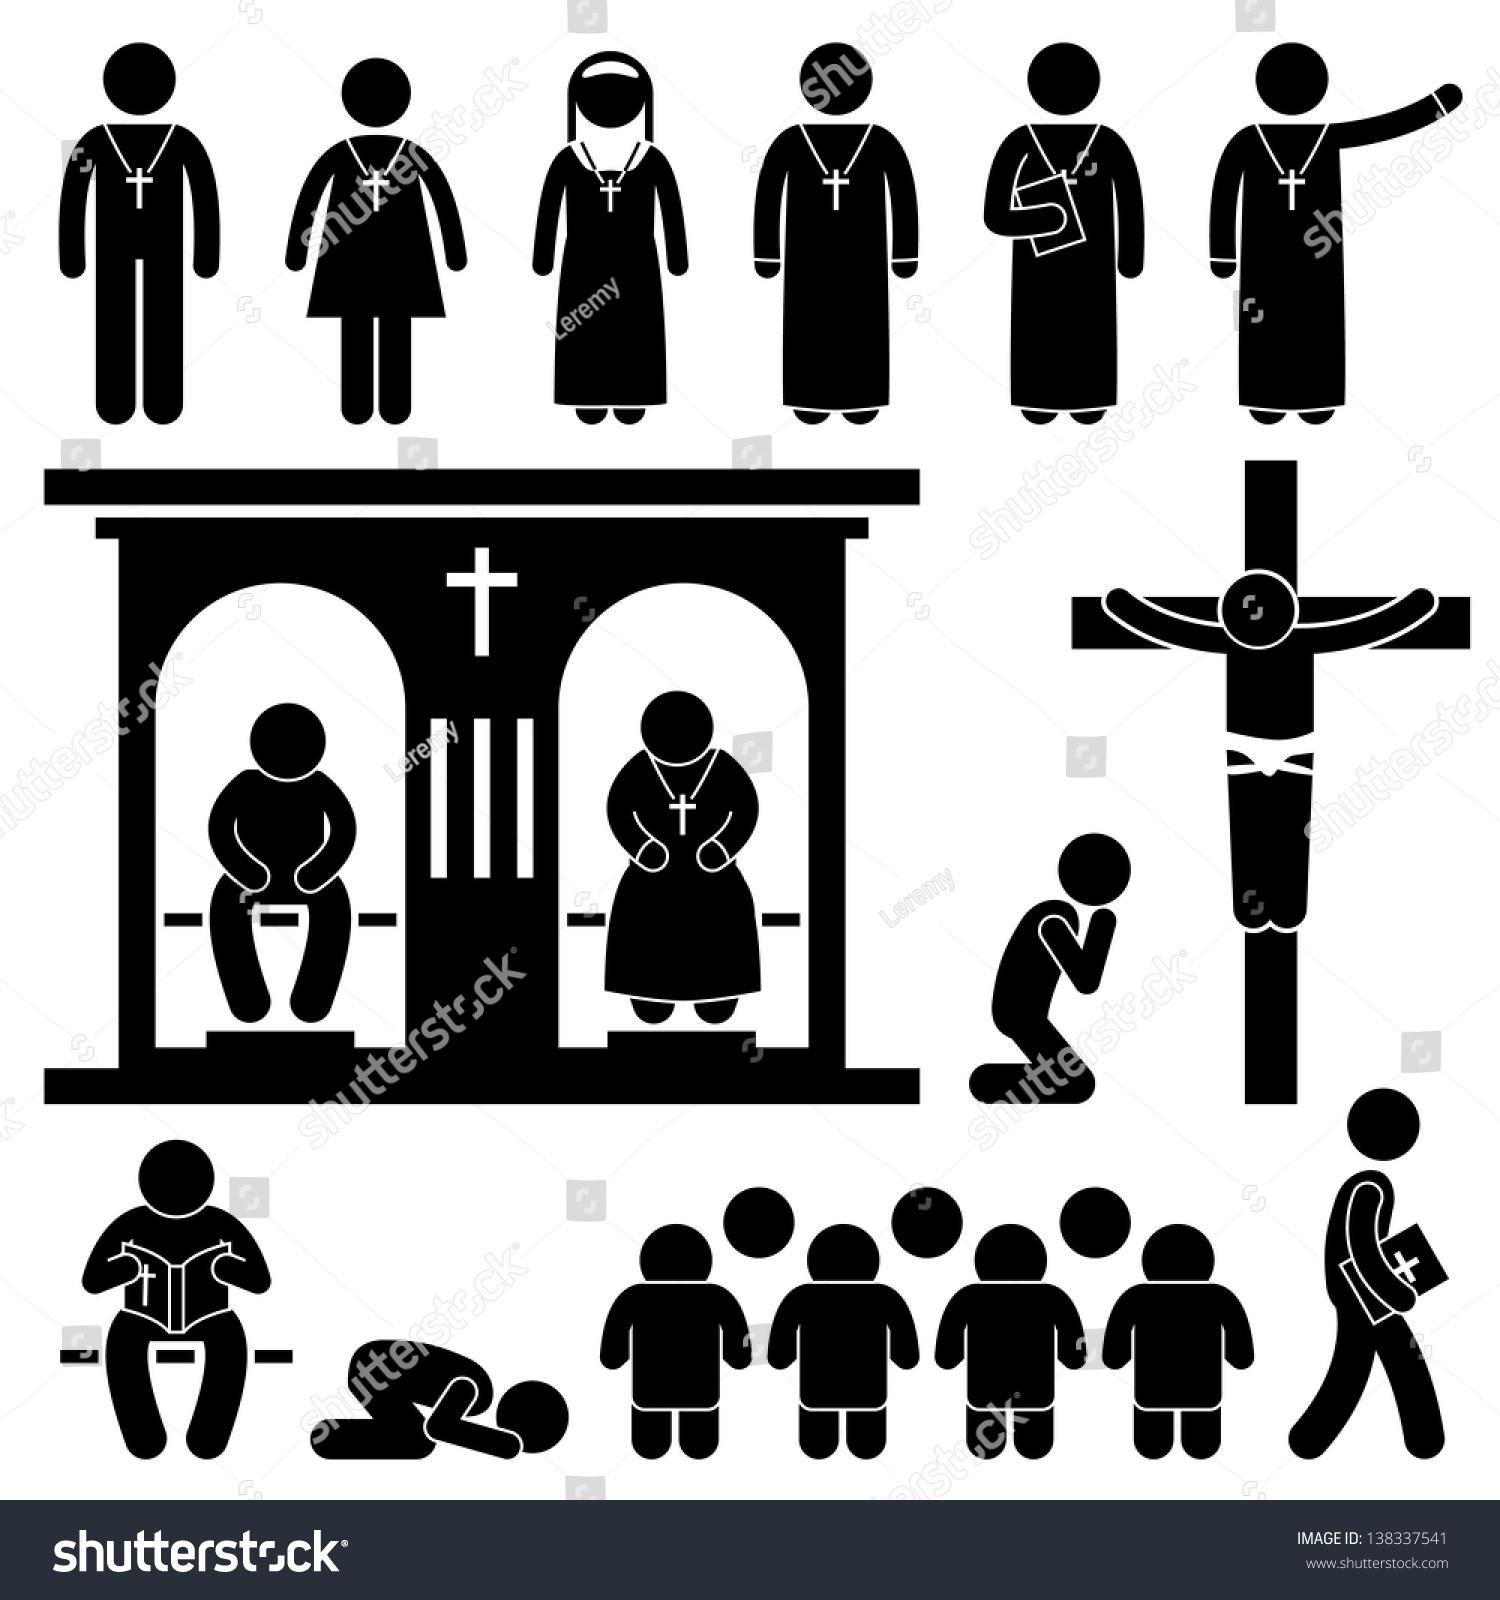 christian protestant cross symbol